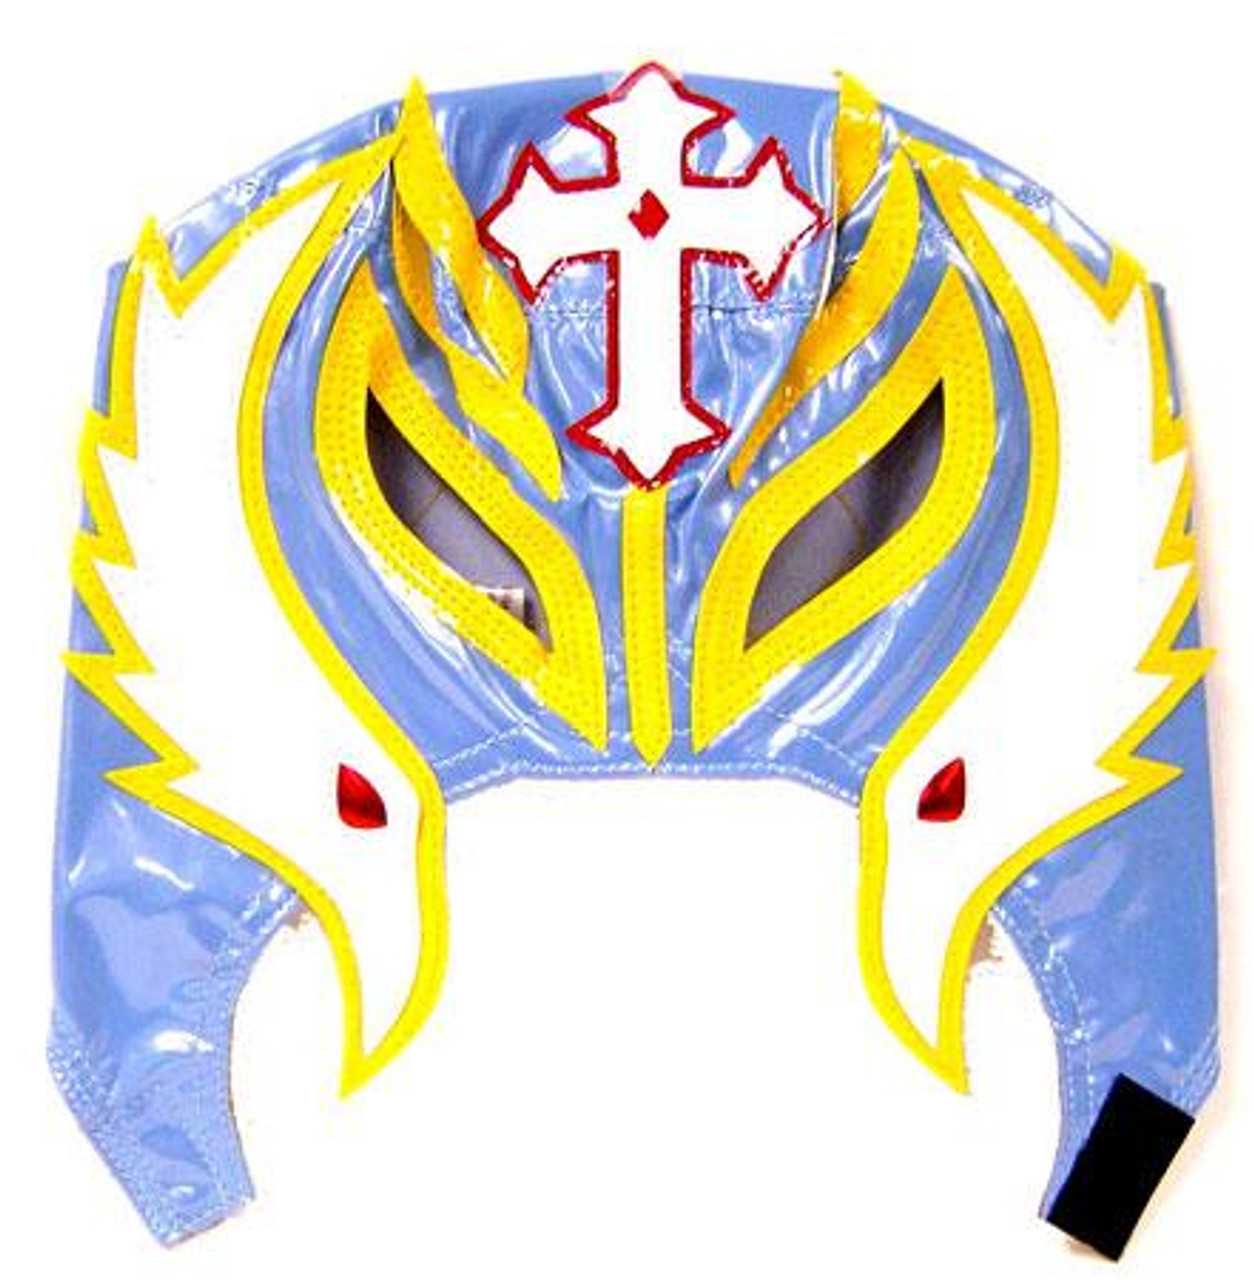 WWE Wrestling Rey Mysterio Replica Mask [Youth, Light Blue & Yellow]